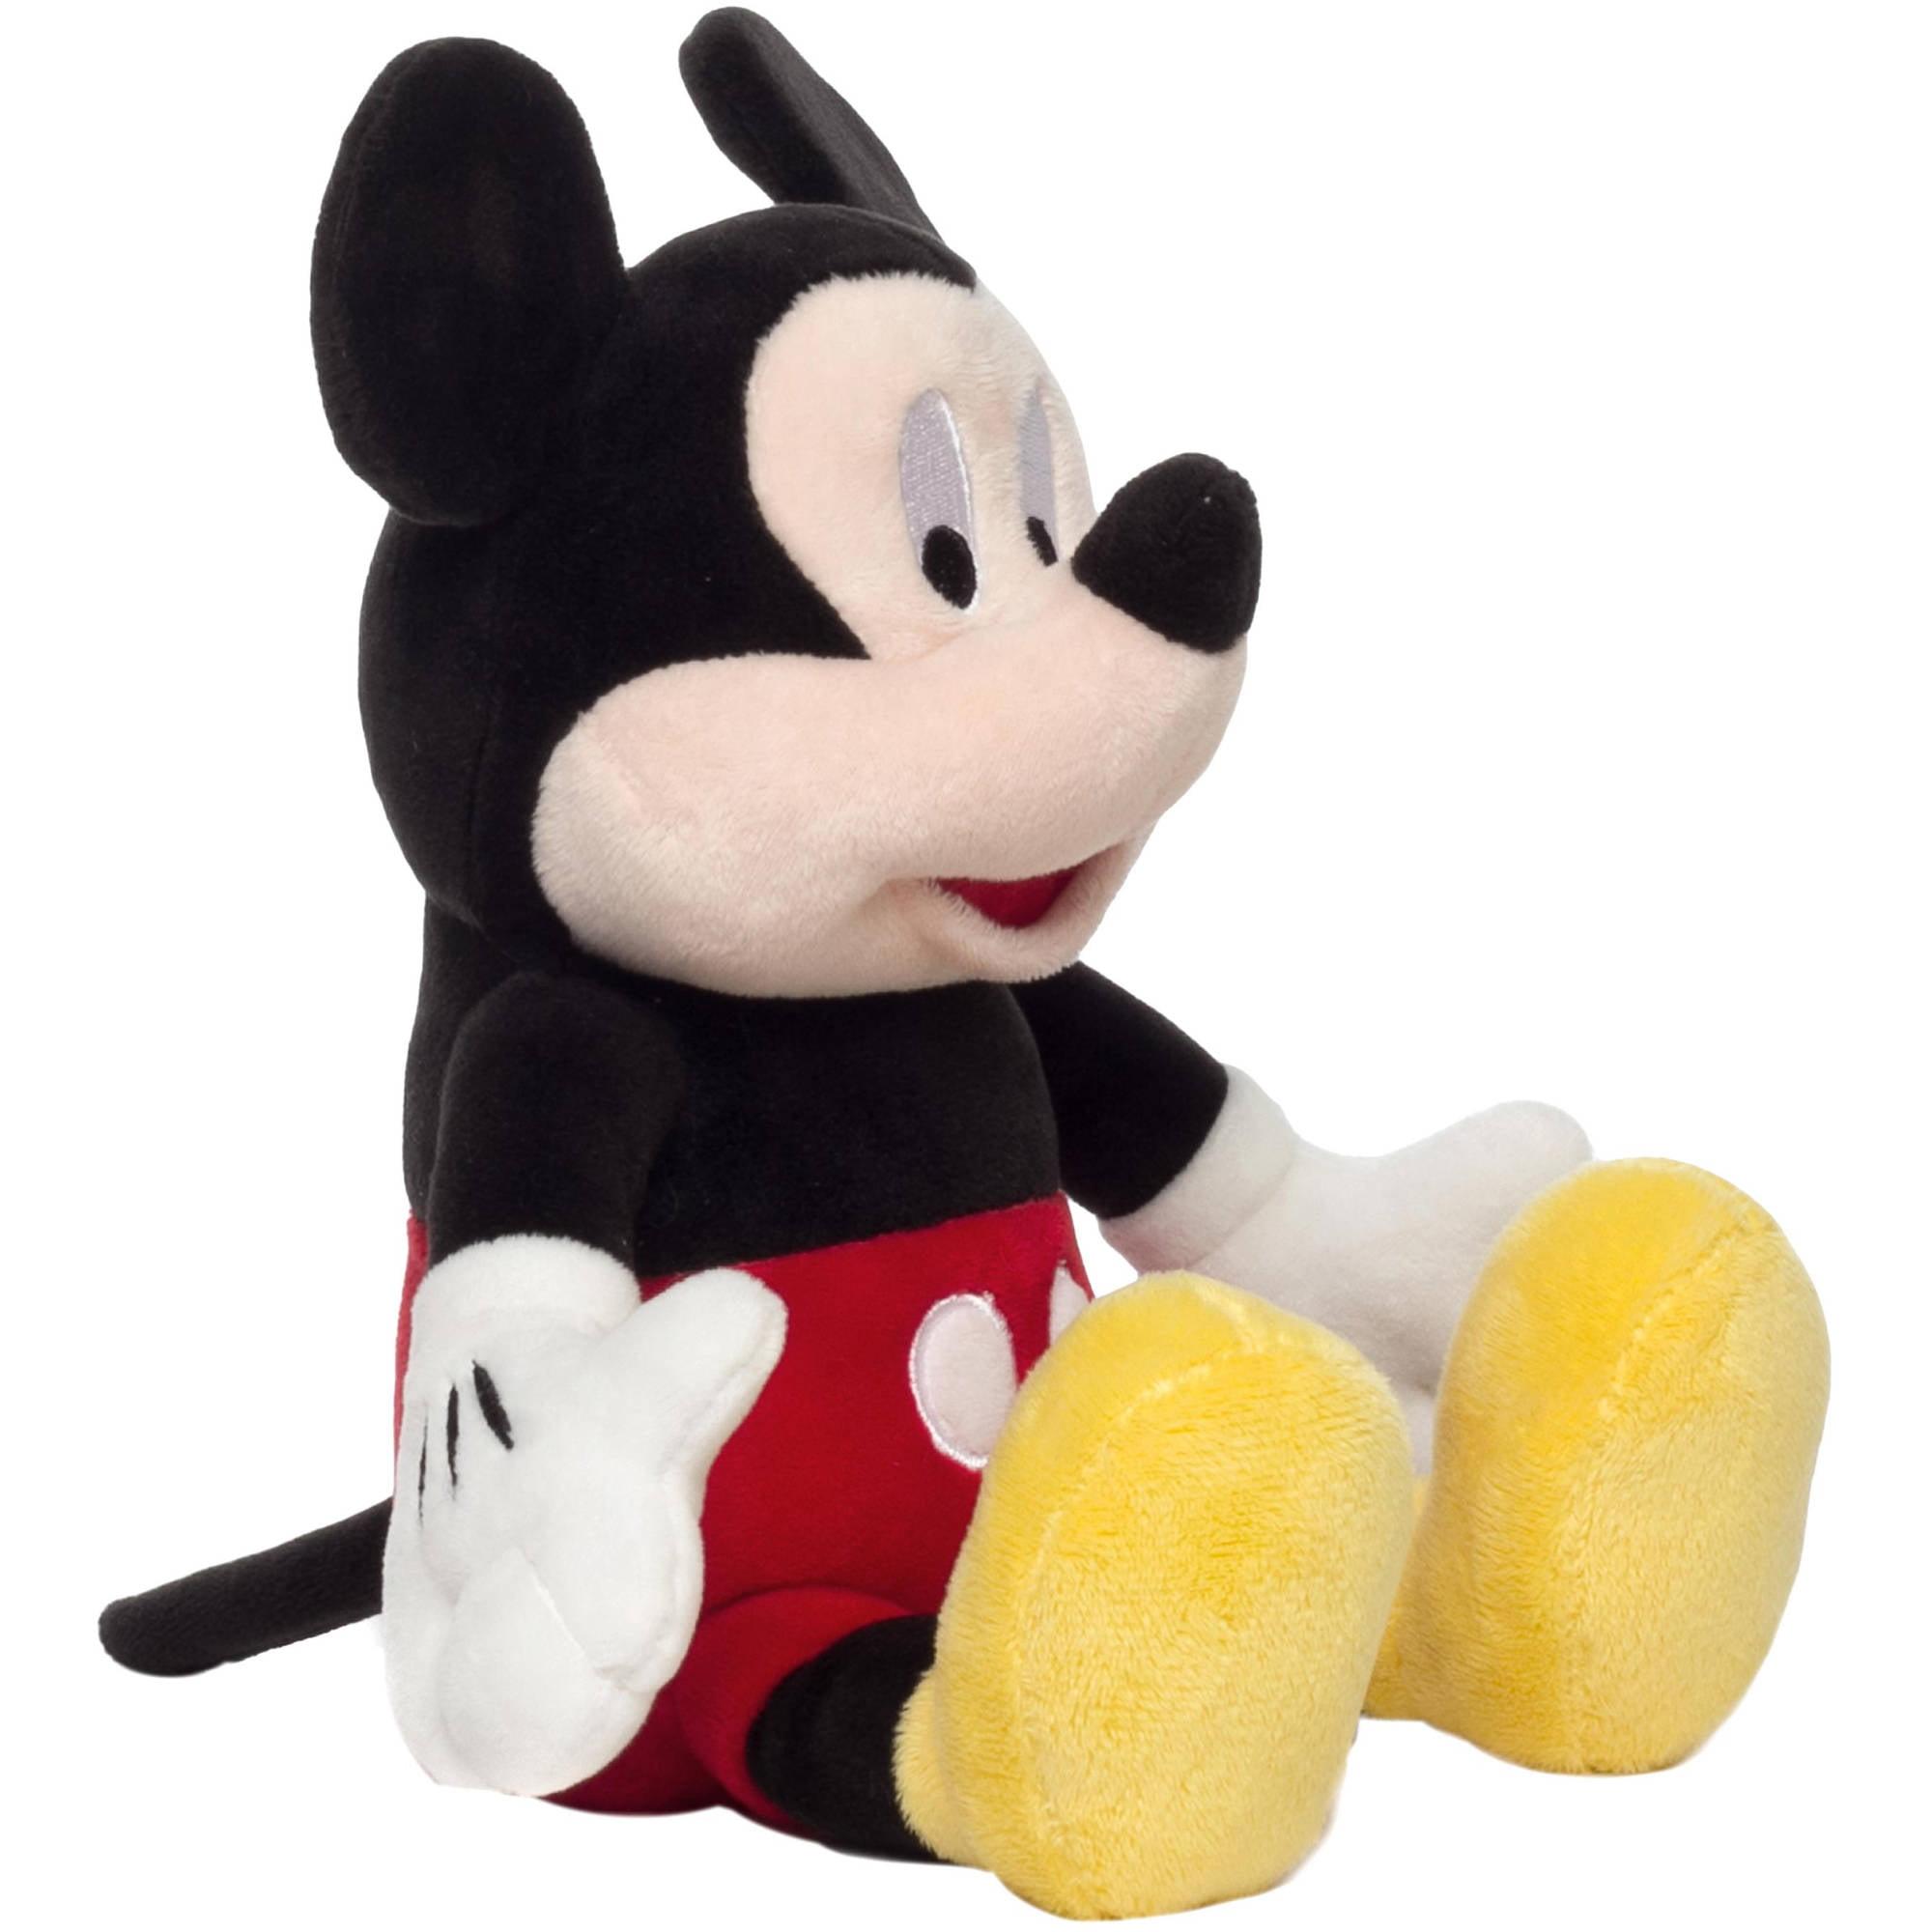 Mickey Mouse Plush Piggy Bank